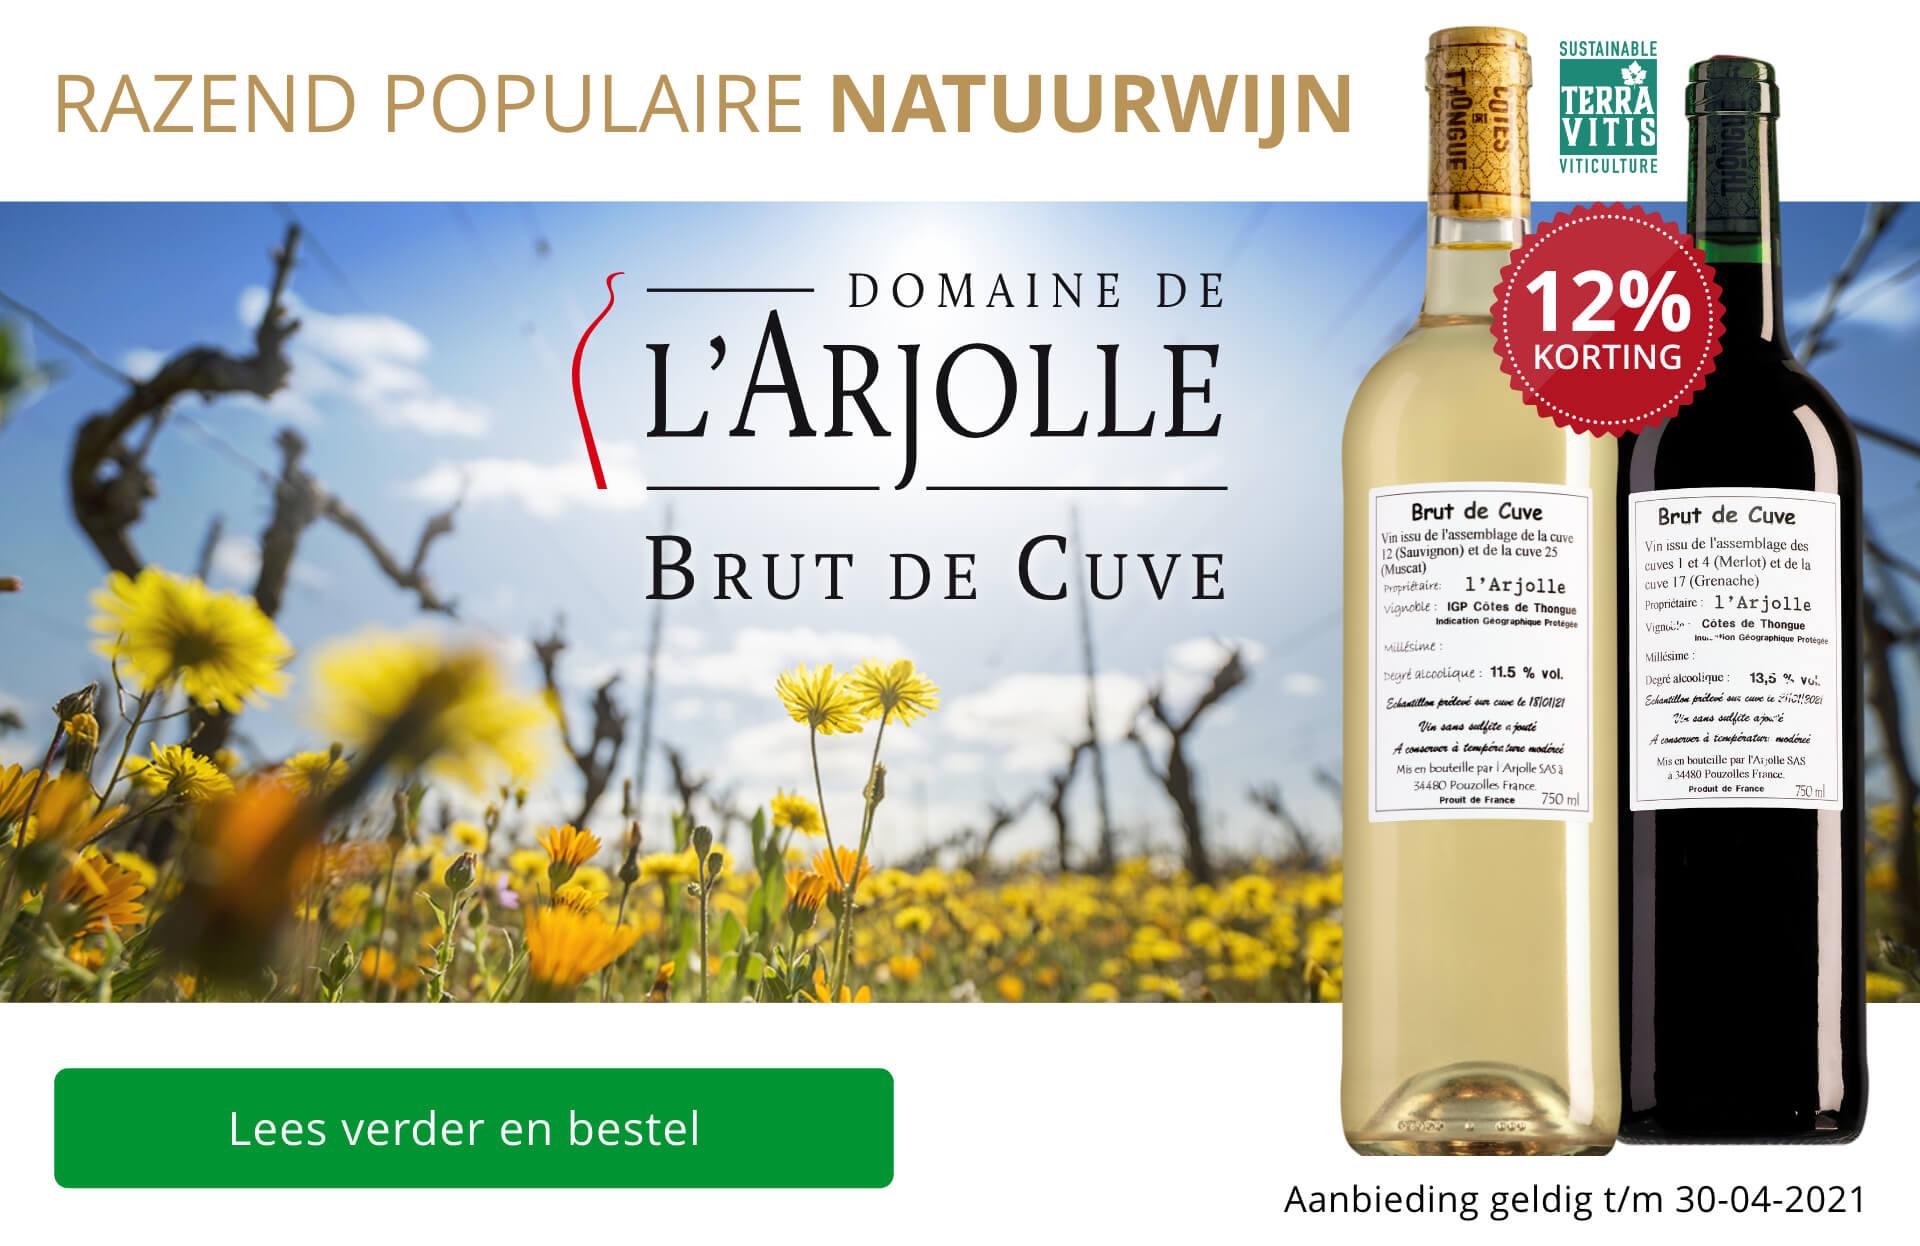 Arjolle Brut de Cuve: beter dan ooit!